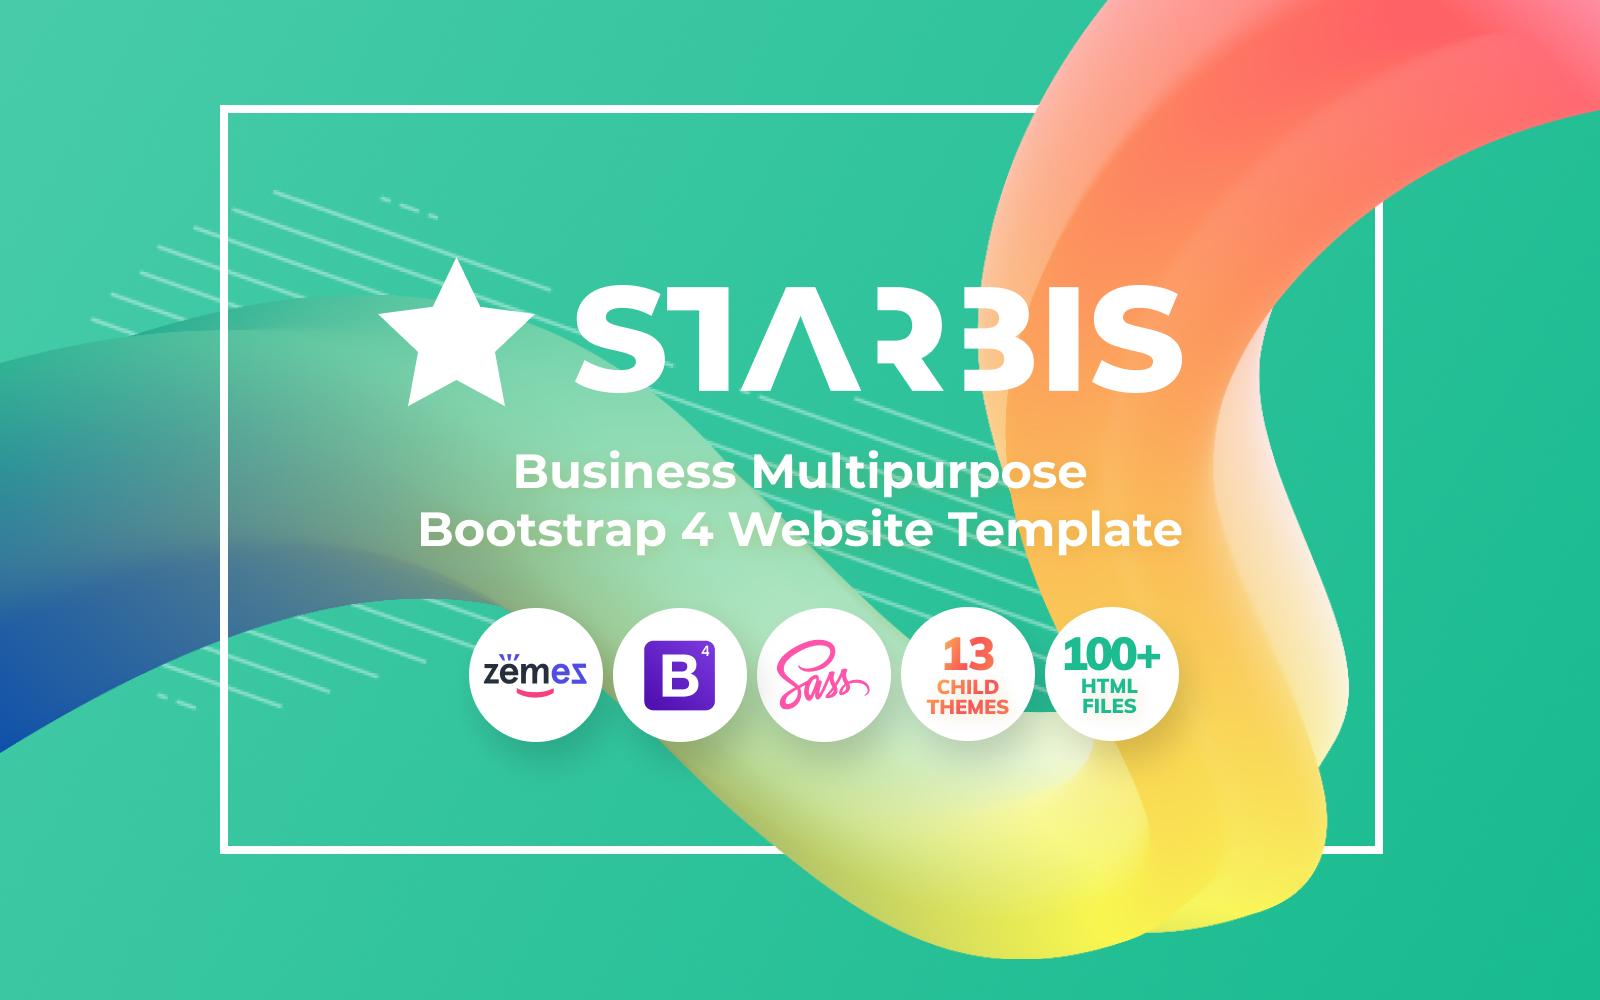 Responsivt Starbis - Business Multipurpose Bootstrap 4 Website Template Hemsidemall #60047